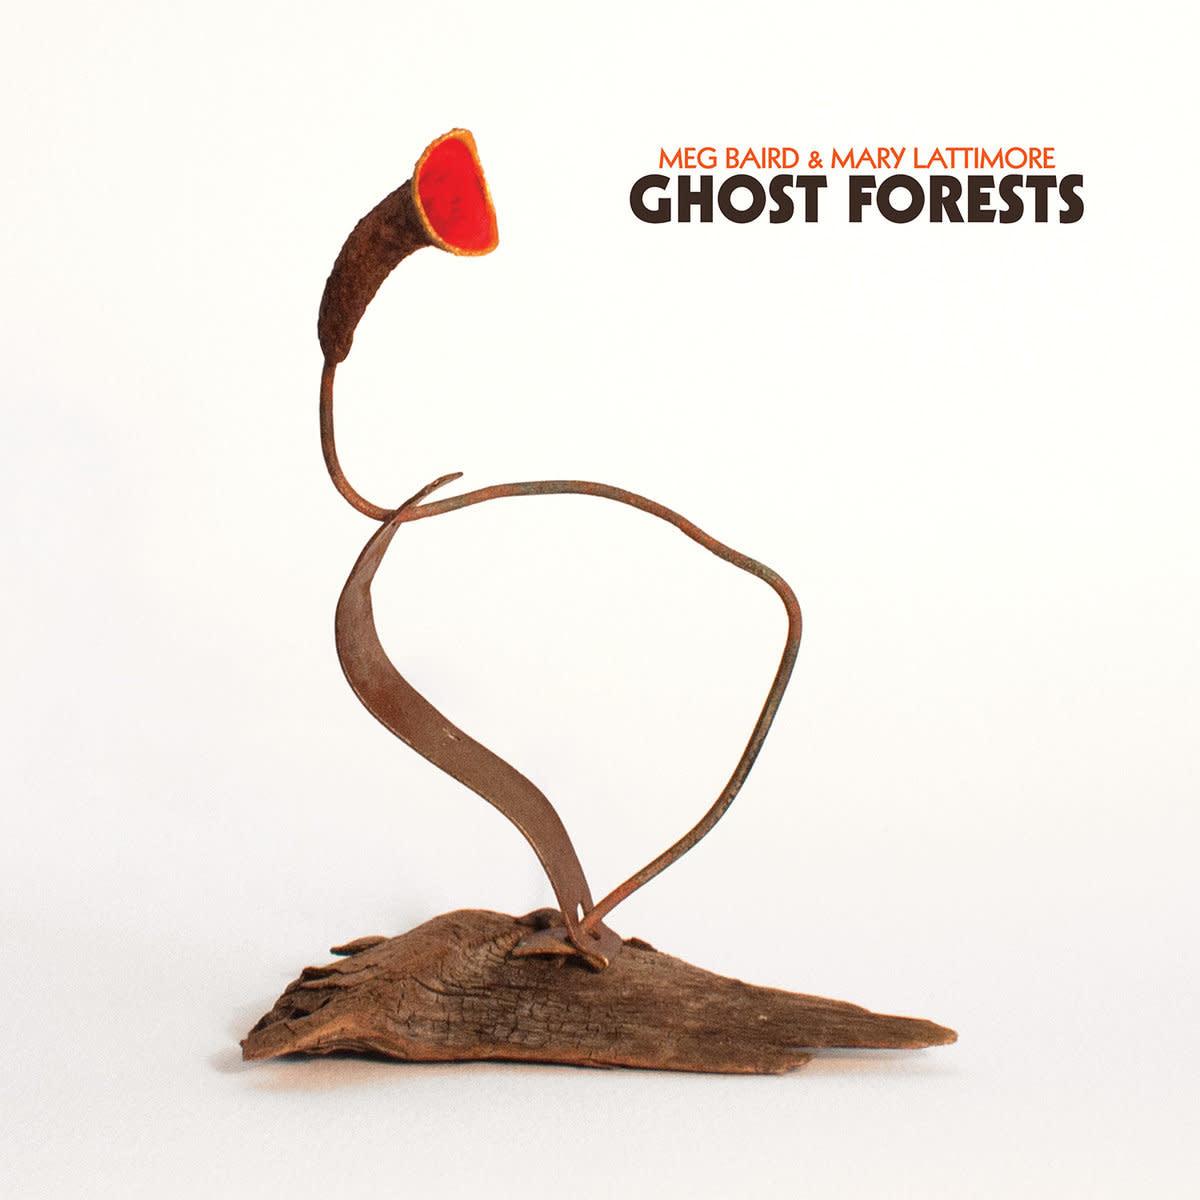 Rock/Pop Meg Baird & Mary Lattimore - Ghost Forests (Coke Bottle Clear)